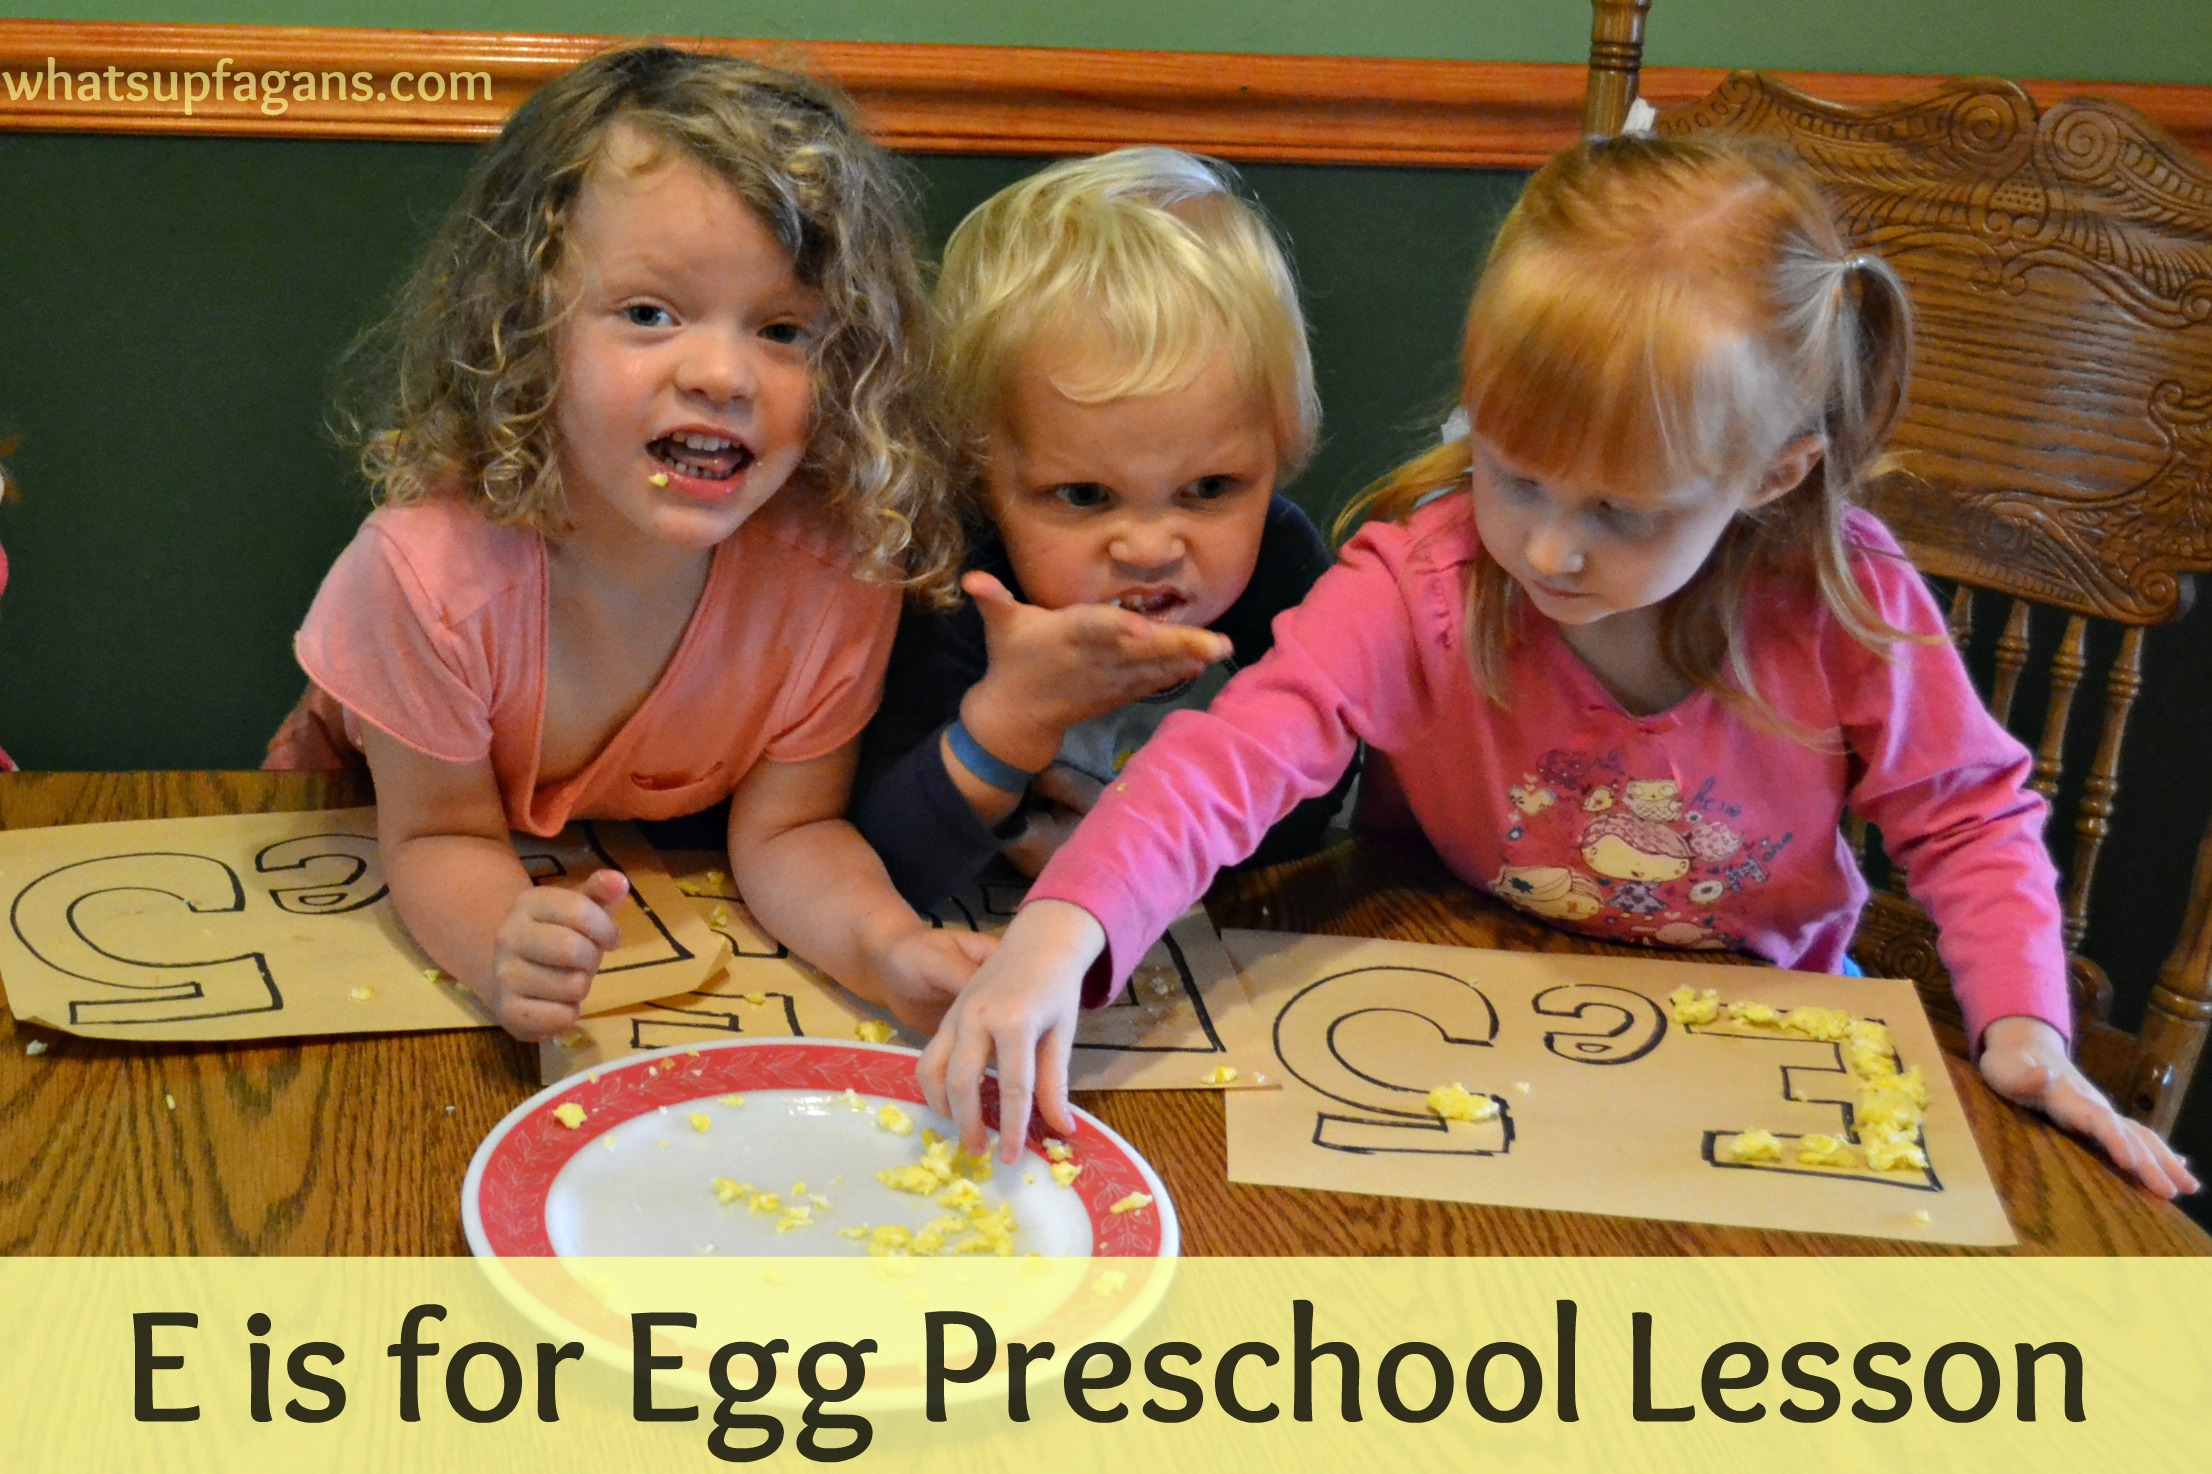 E Is For Egg Preschool Lesson